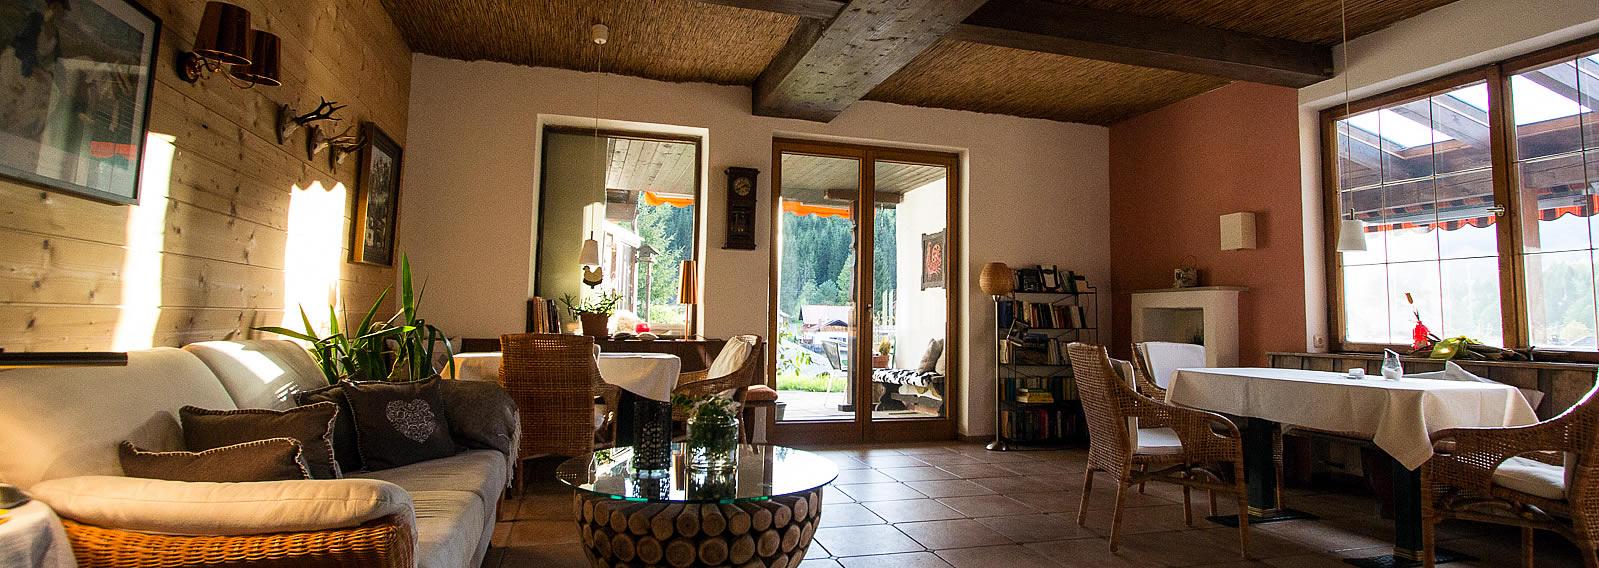 Rusticana Kamin Zimmer